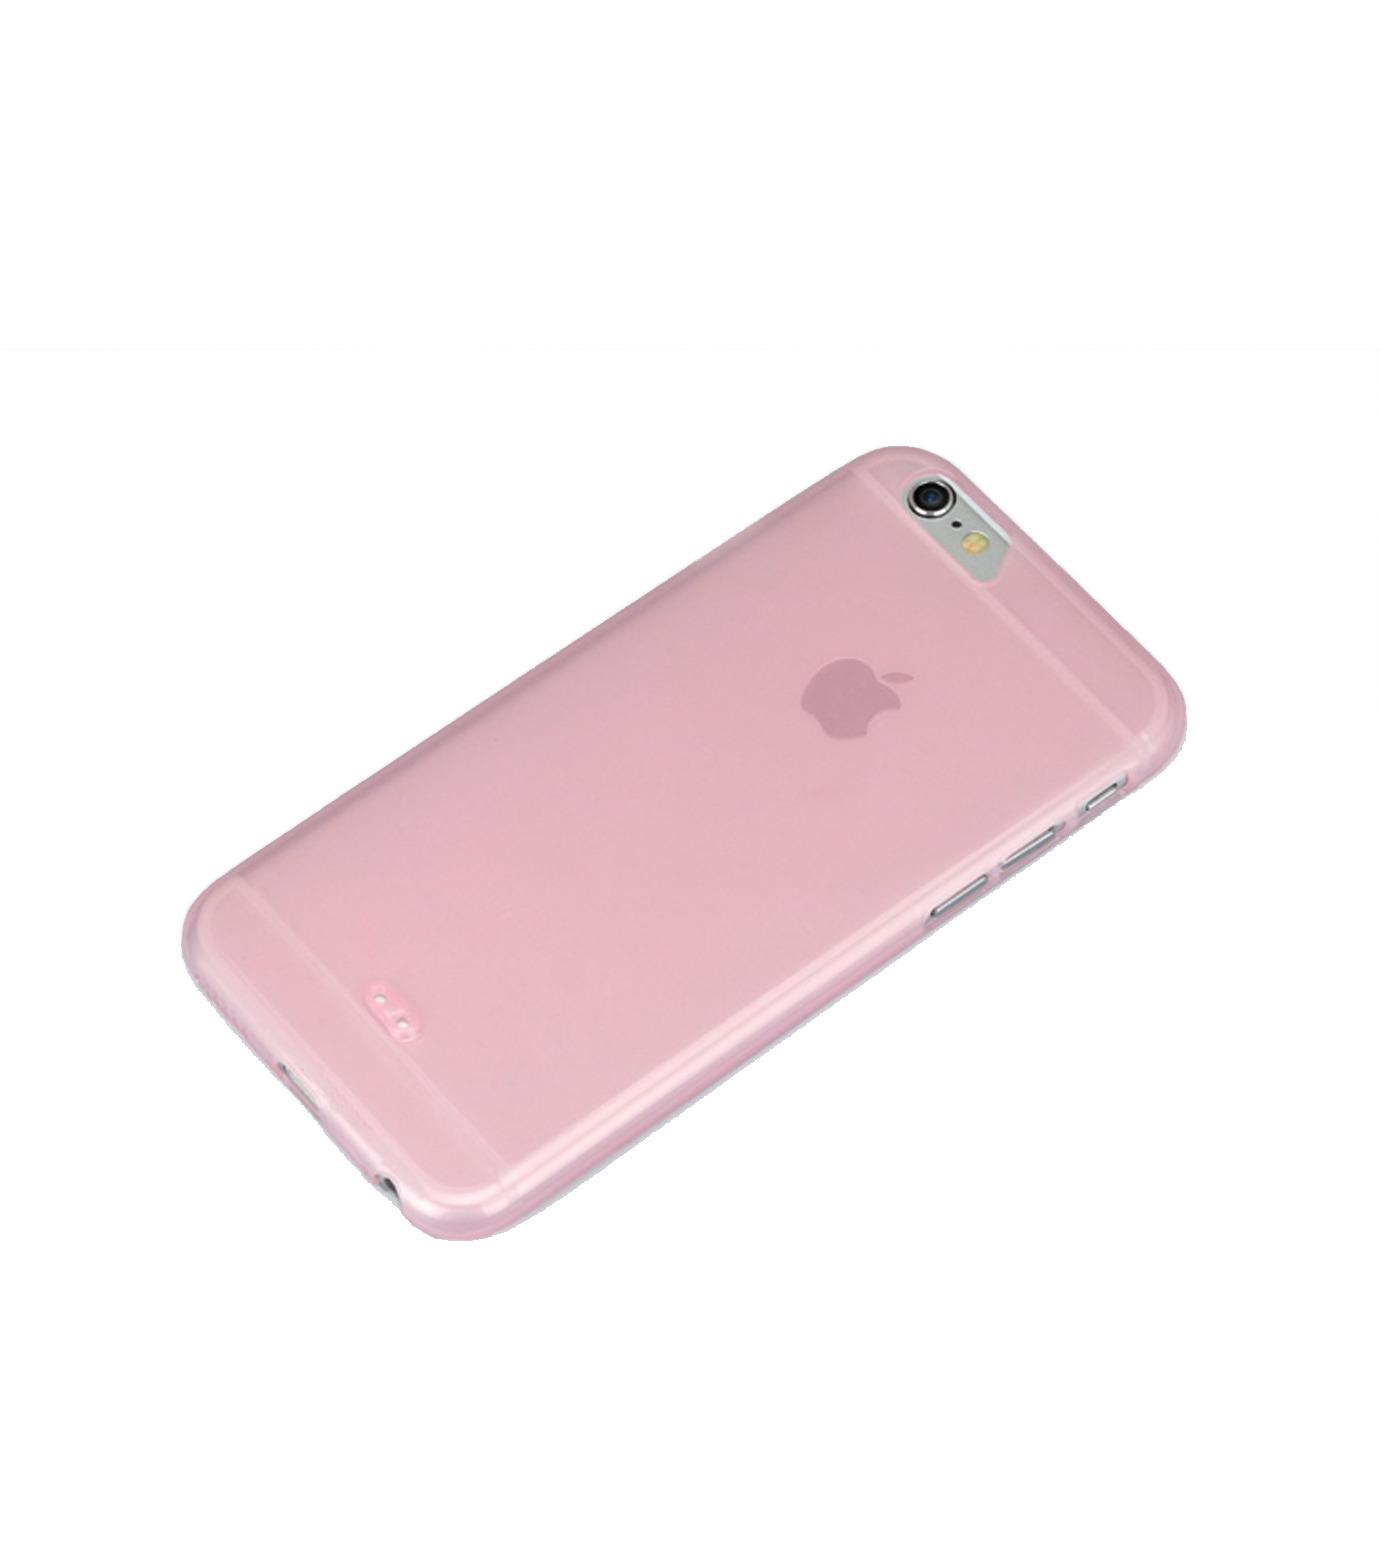 Tunewear(チューンウエア)のeggshell 6/6s-CHARCHOL GRAY(ケースiphone6/6s/case iphone6/6s)-TUN-PH-0394-12 拡大詳細画像2